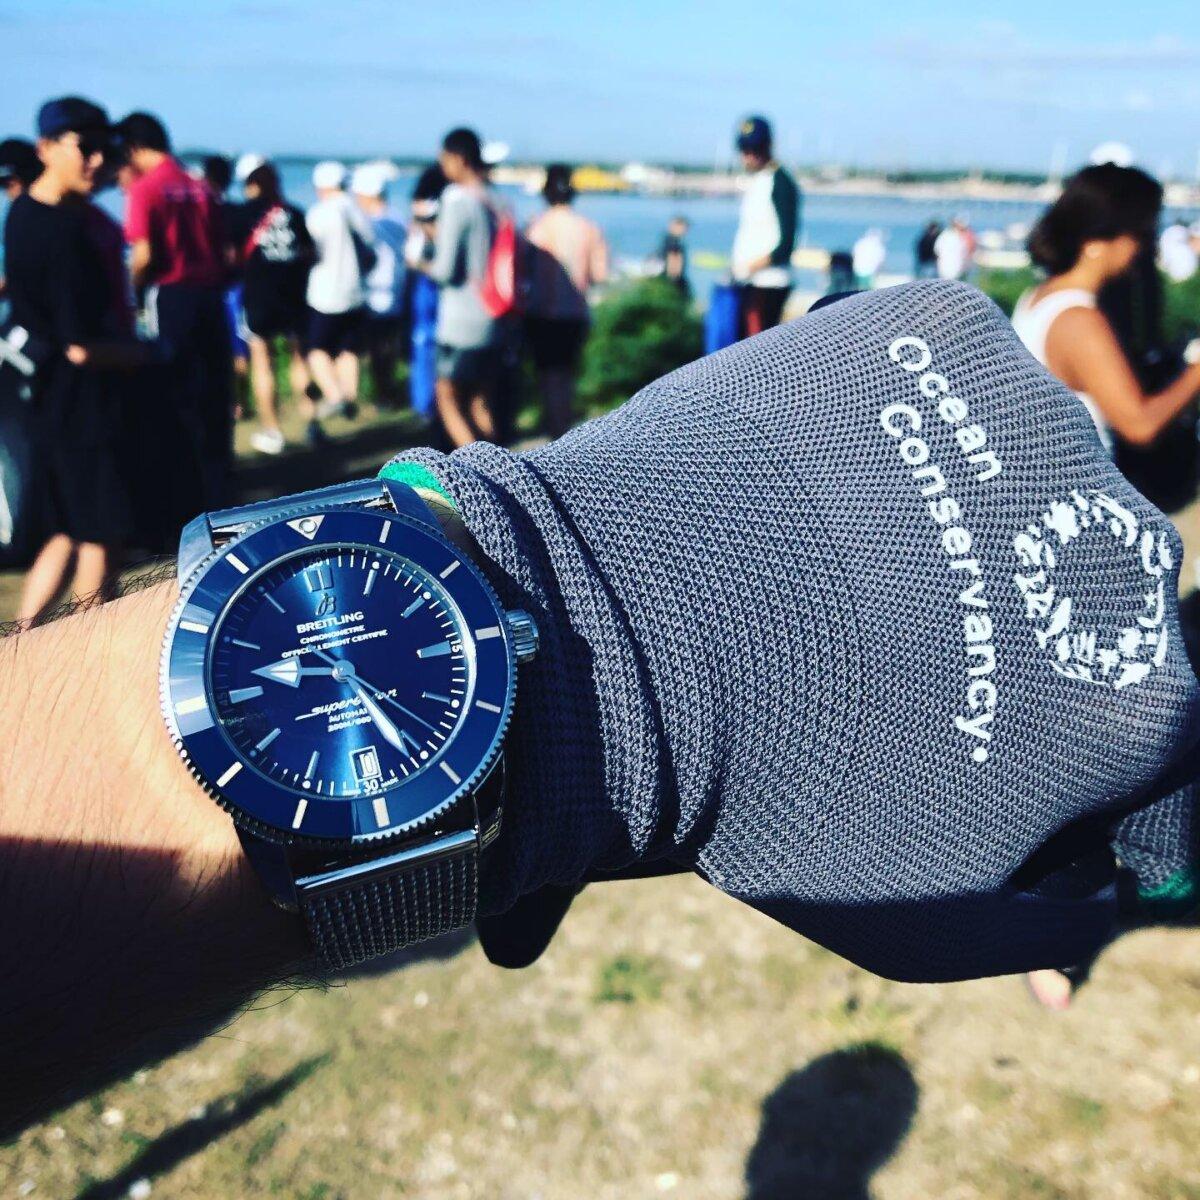 EFFFDB6B-D1C9-466A-956E-F92EA91EBFF5 腕時計は旅の特別な瞬間をより格別なものにしてくれる/ブライトリング ビーチクリーンイベント|関口 優